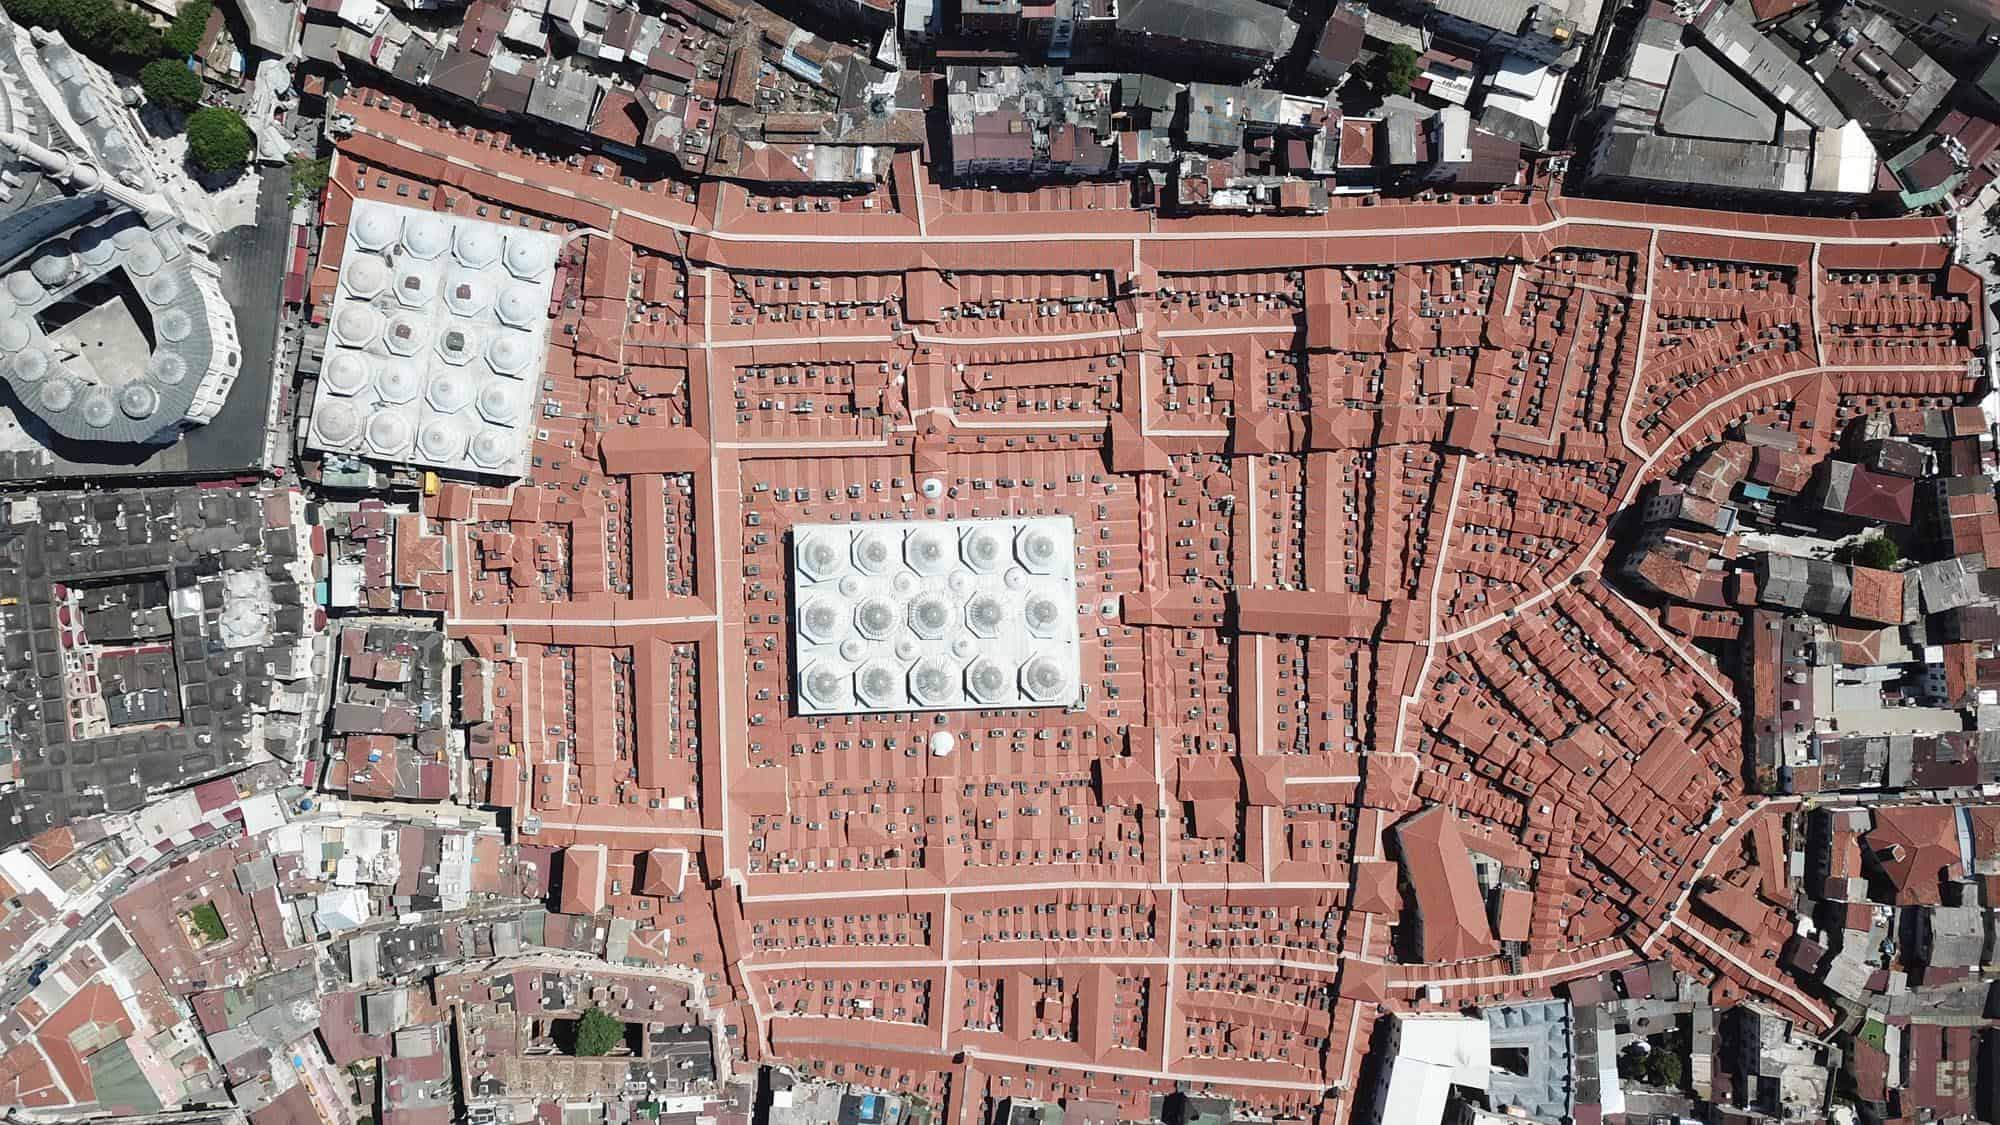 Grand Bazaar Aerial View